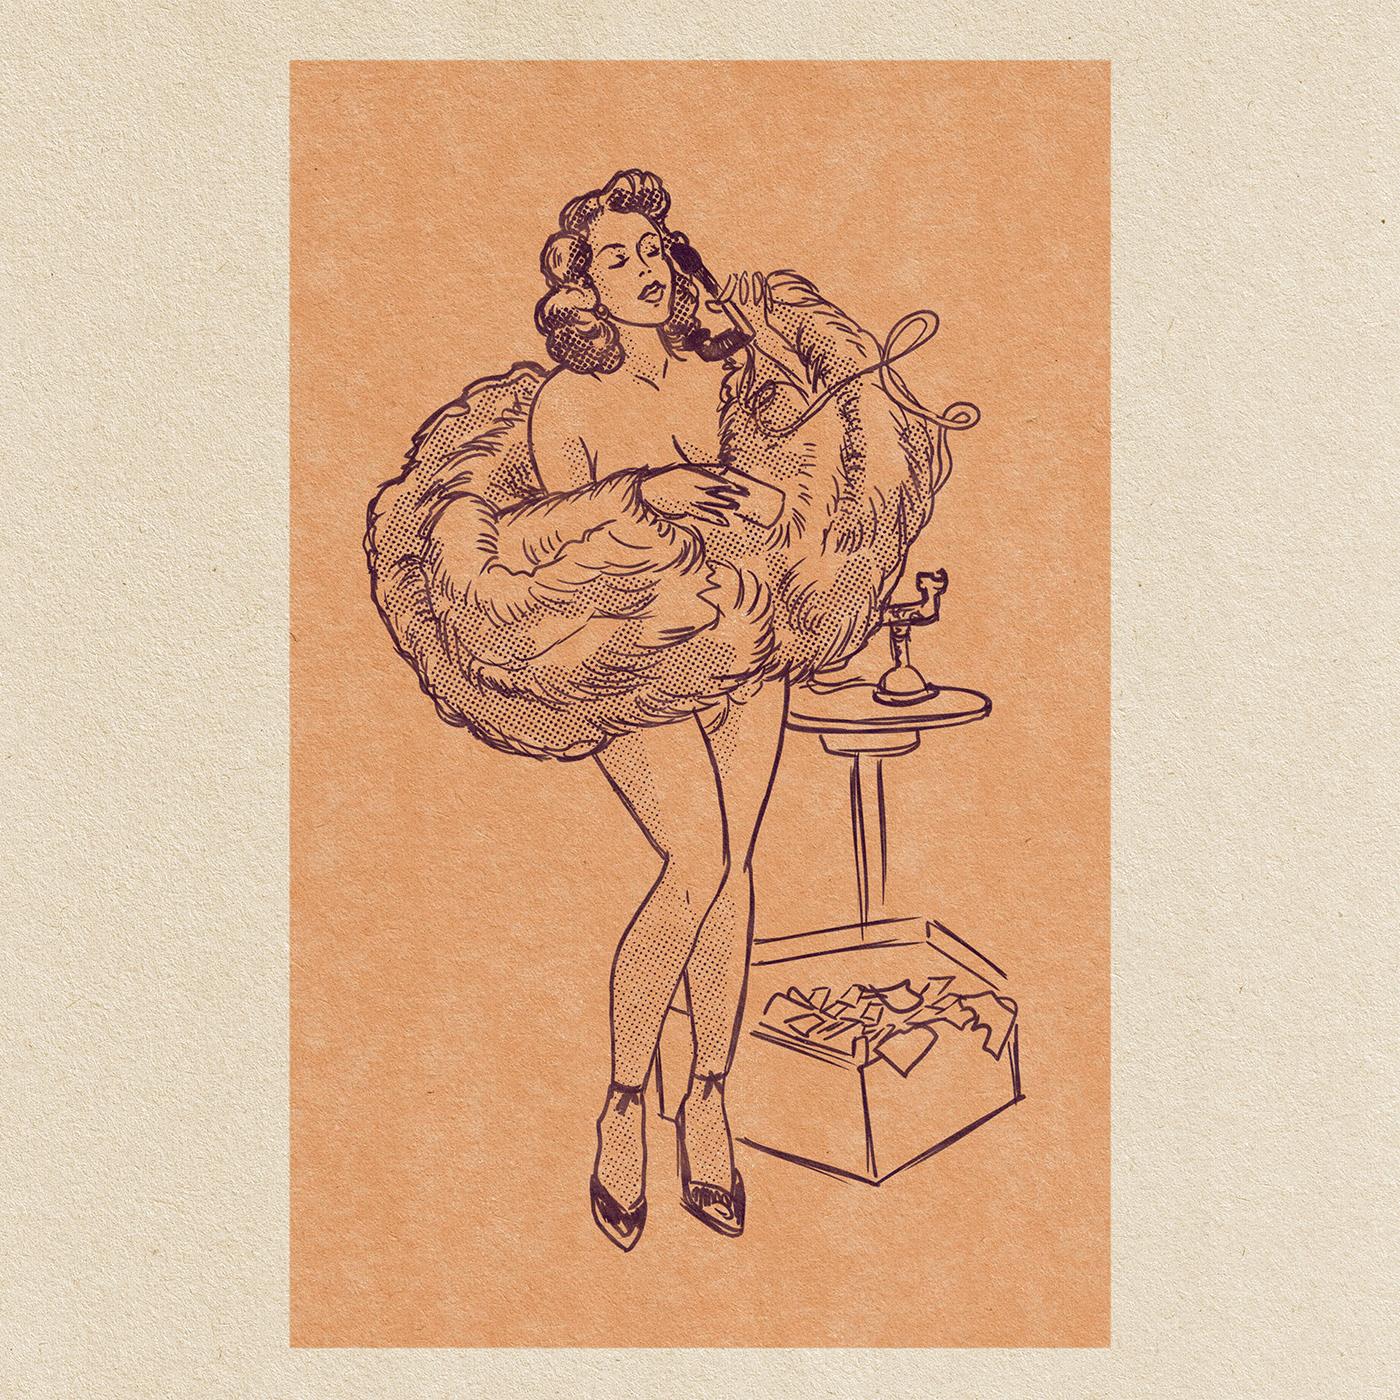 comic drawings midcenturyillustration retroillustrations vintagecomics vintagedrawings